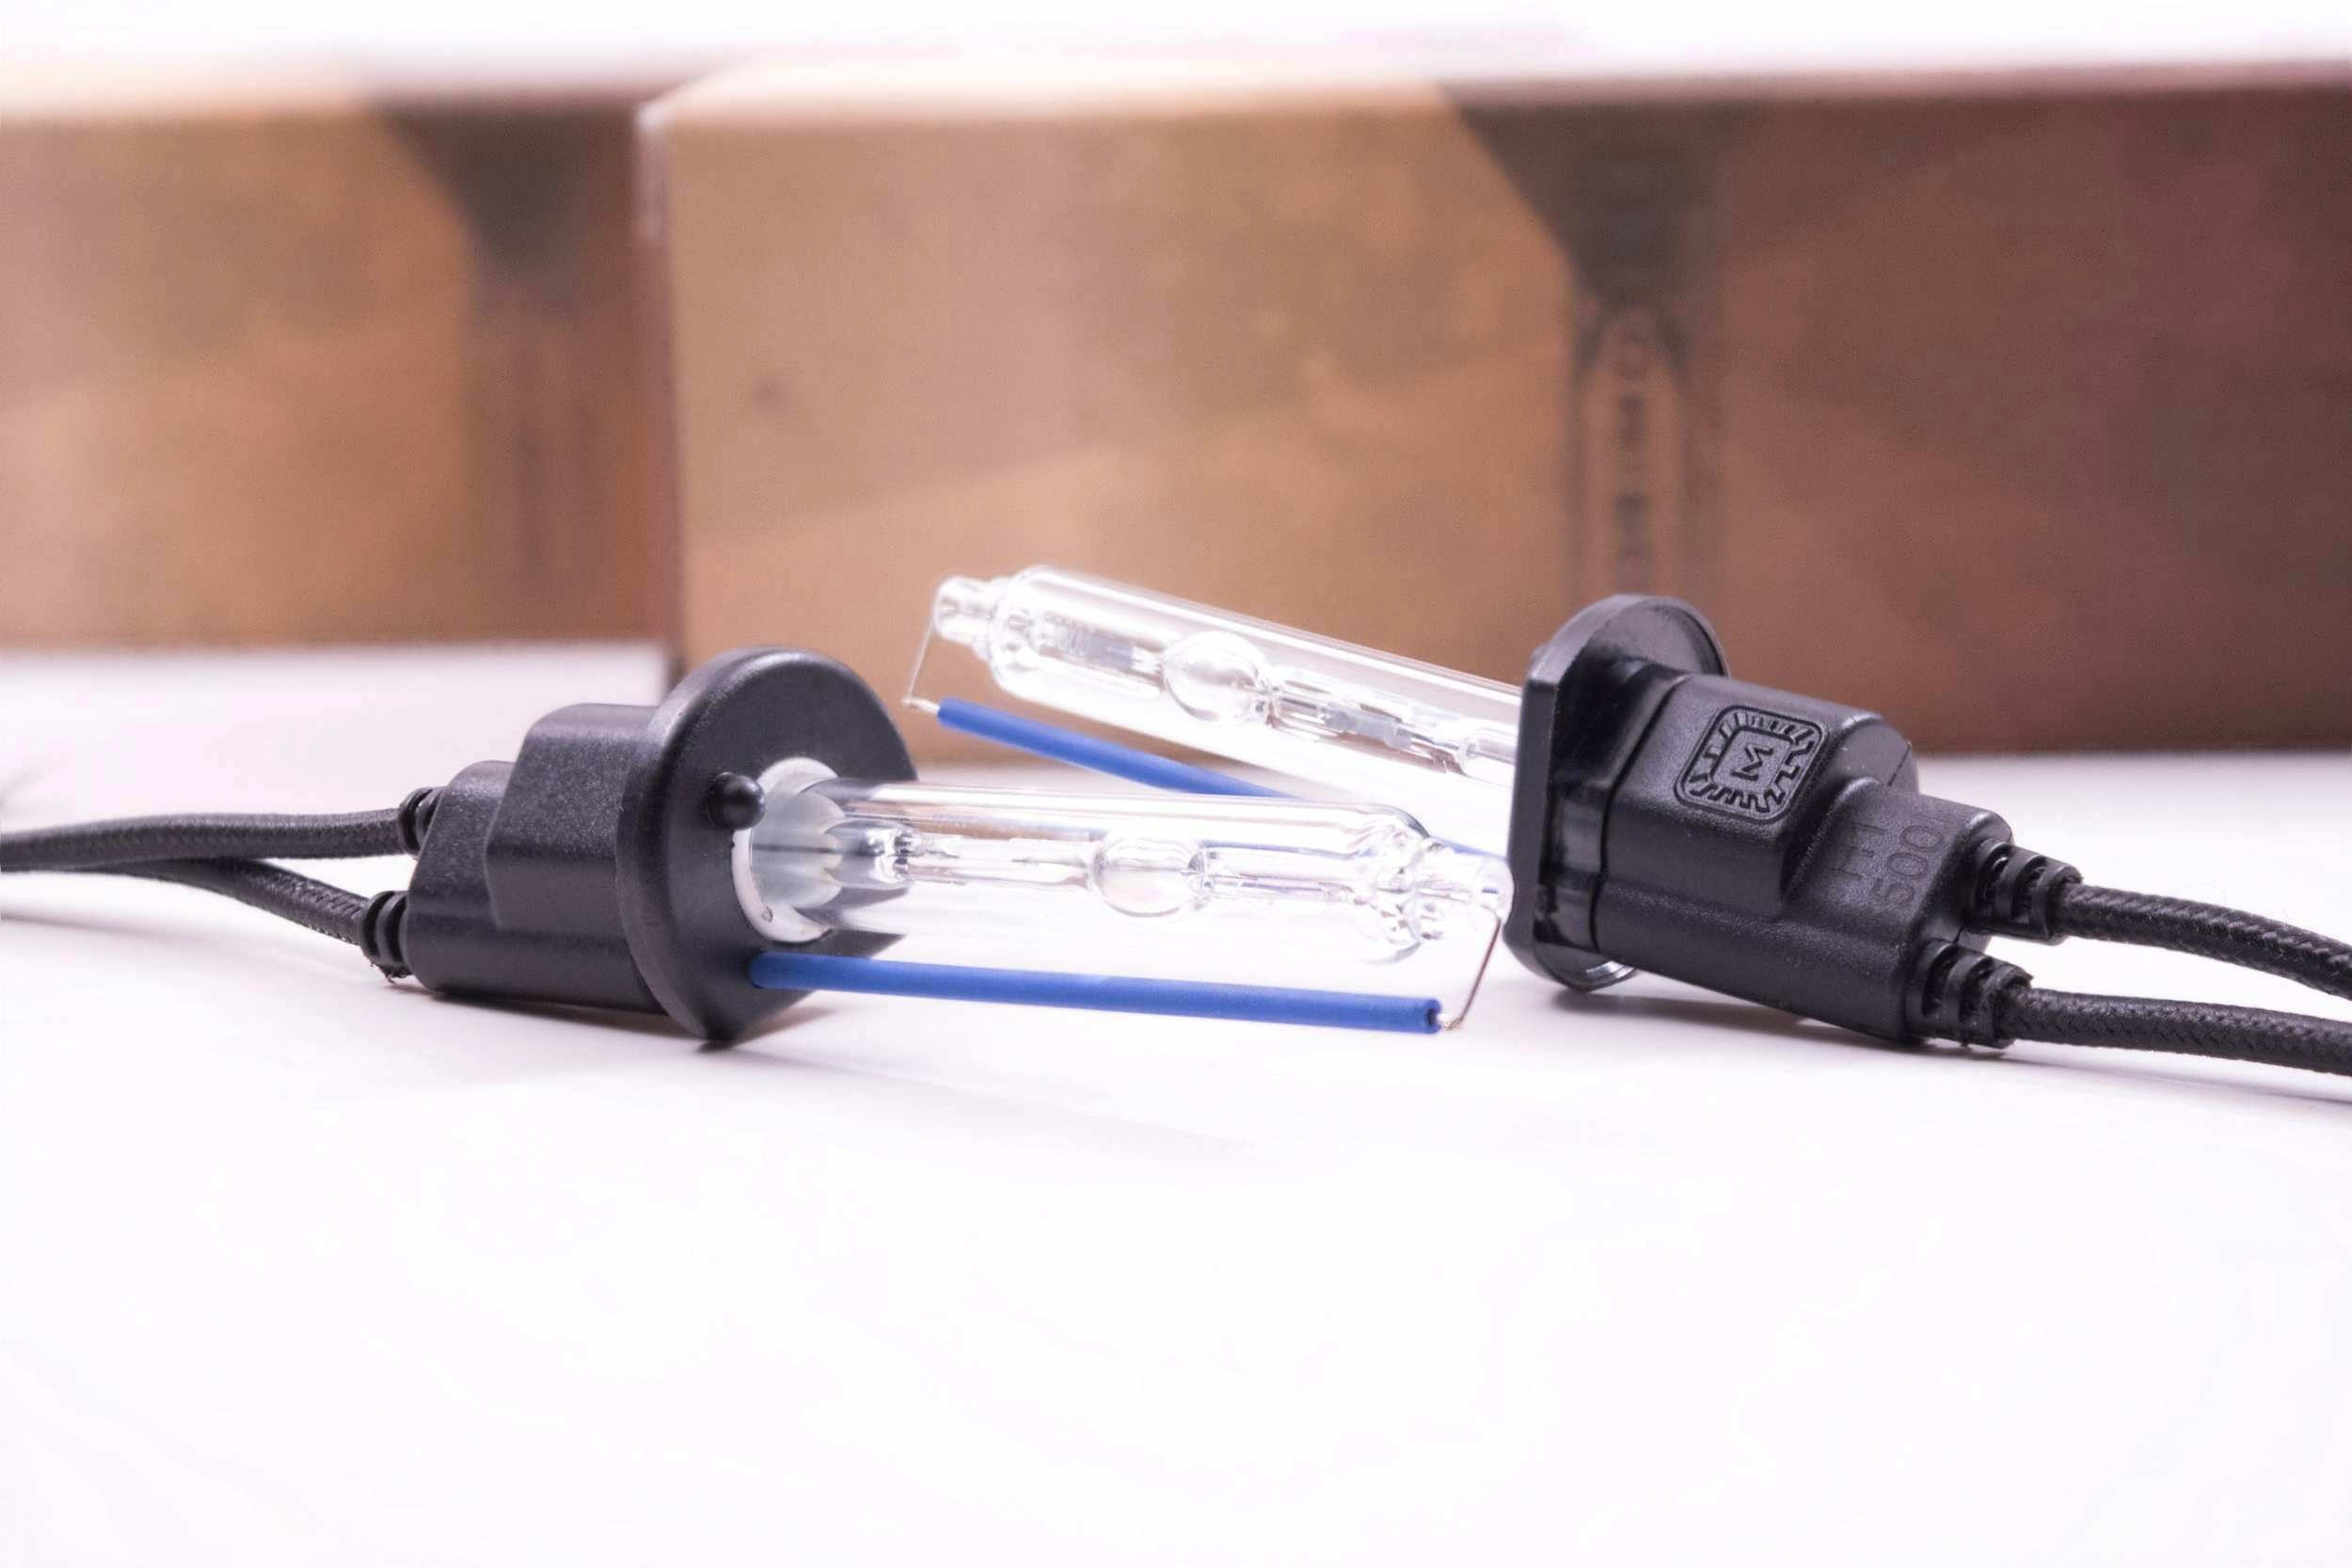 Morimoto Retro-Quik: Audi A4 B6 (02-06) | HID Kit Pros